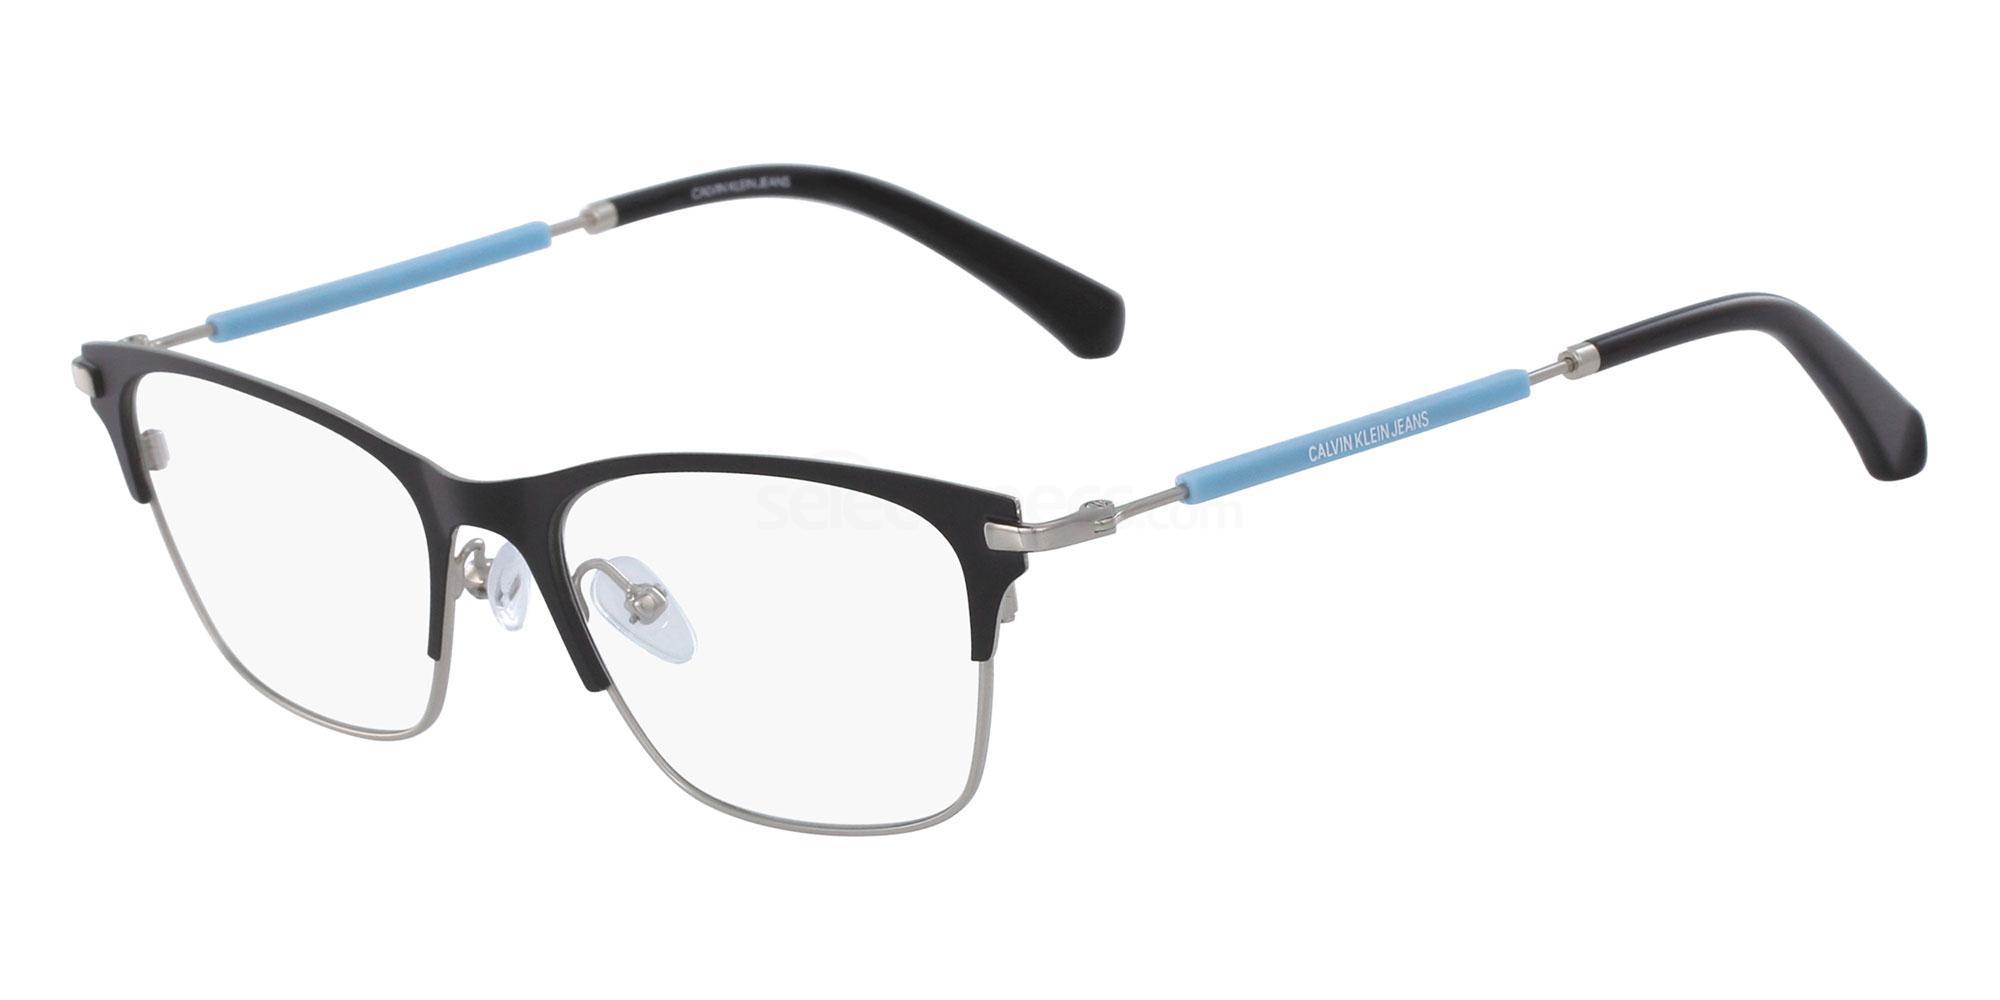 001 CKJ18105 Glasses, Calvin Klein Jeans